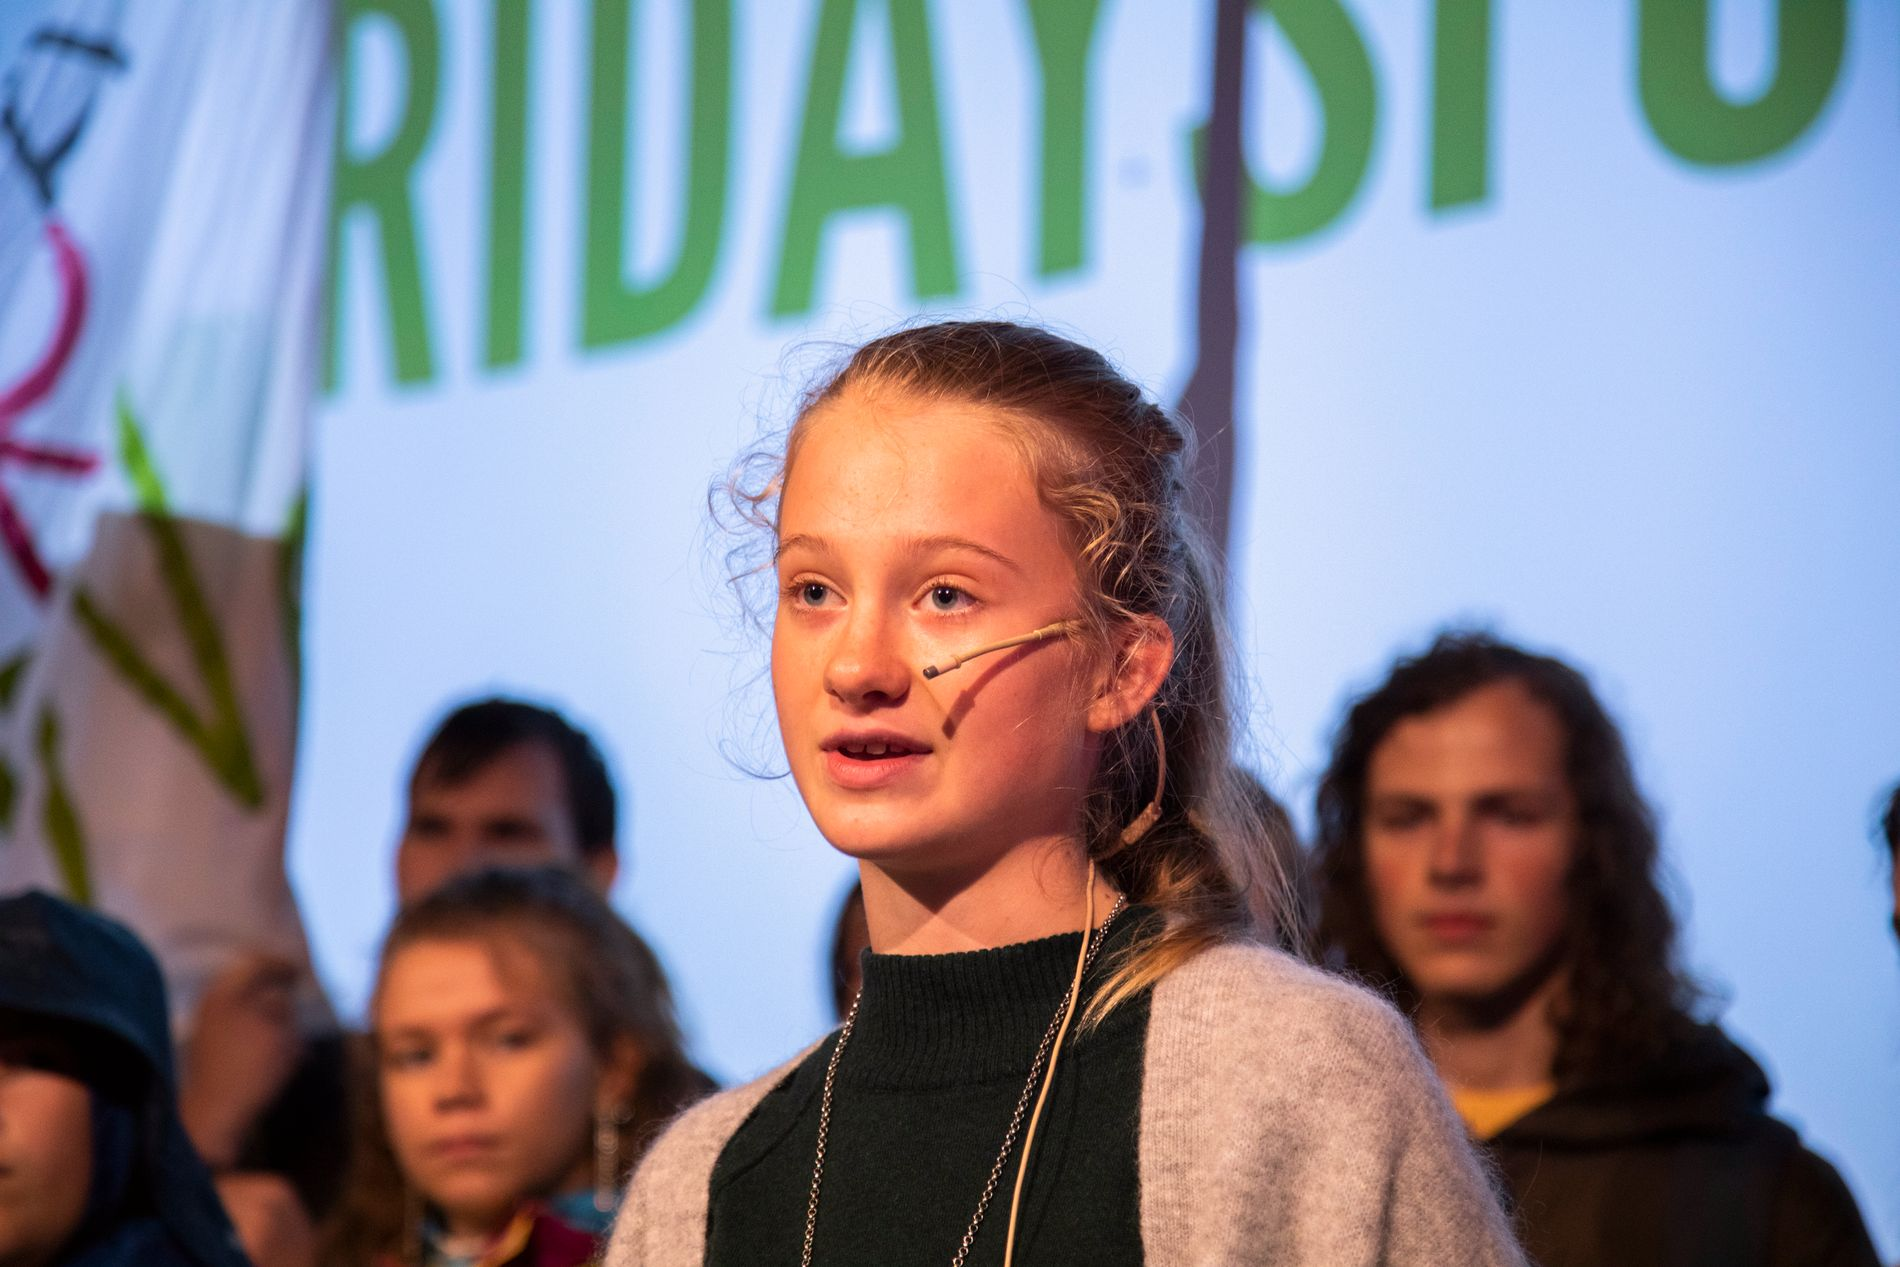 MILJØAGETNT: «Jeg vil ha en fremtid, også når dere er døde», sa Penelope Lea (14) frå Miljøagentene. Ho fekk halde landsmøtets første tale.